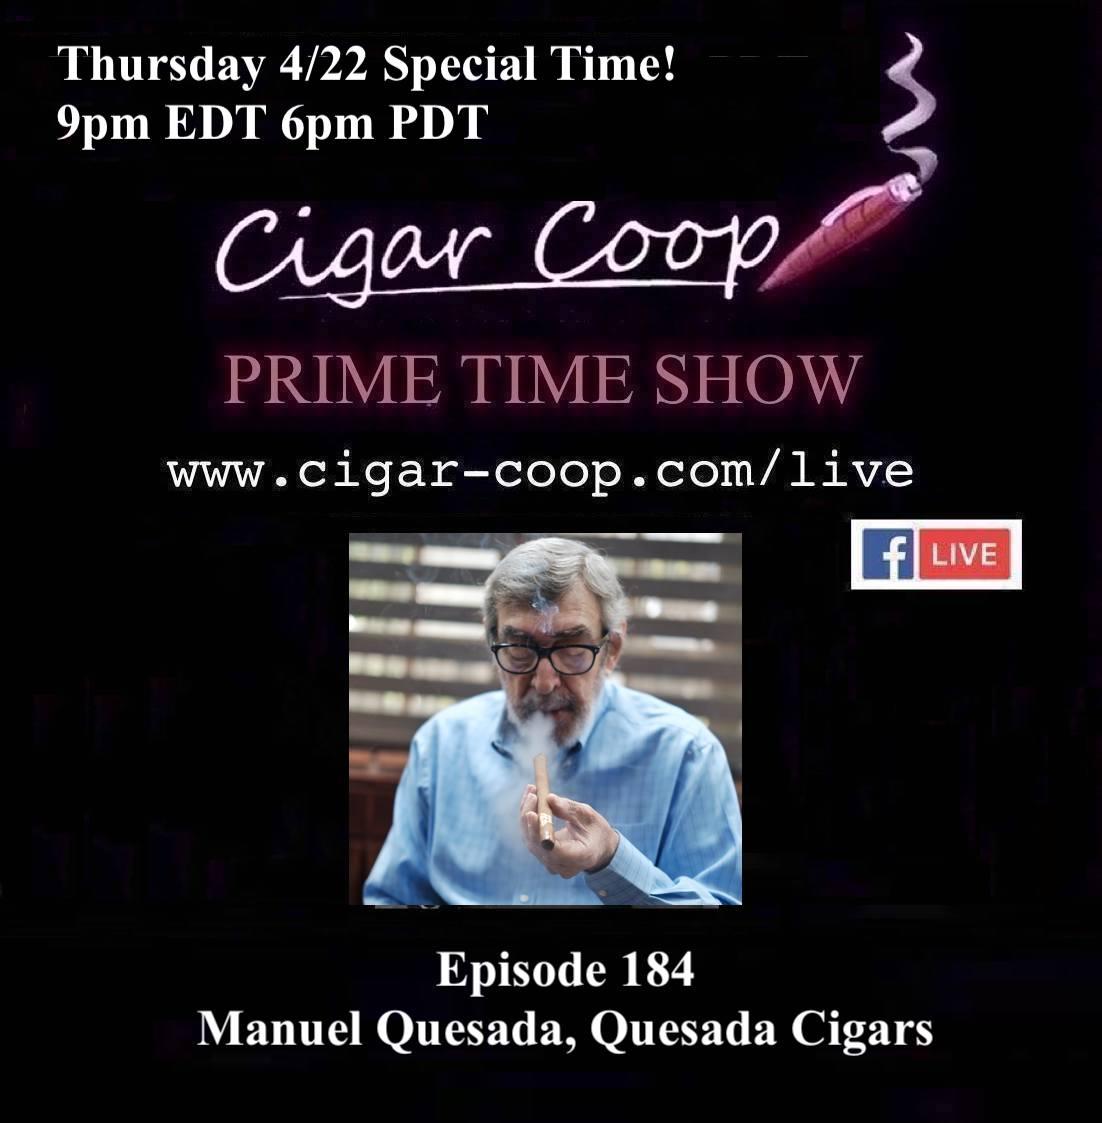 Announcement: Prime Time Episode 184 – Manuel Quesada, Quesada Cigars – Special Time 9pm EDT